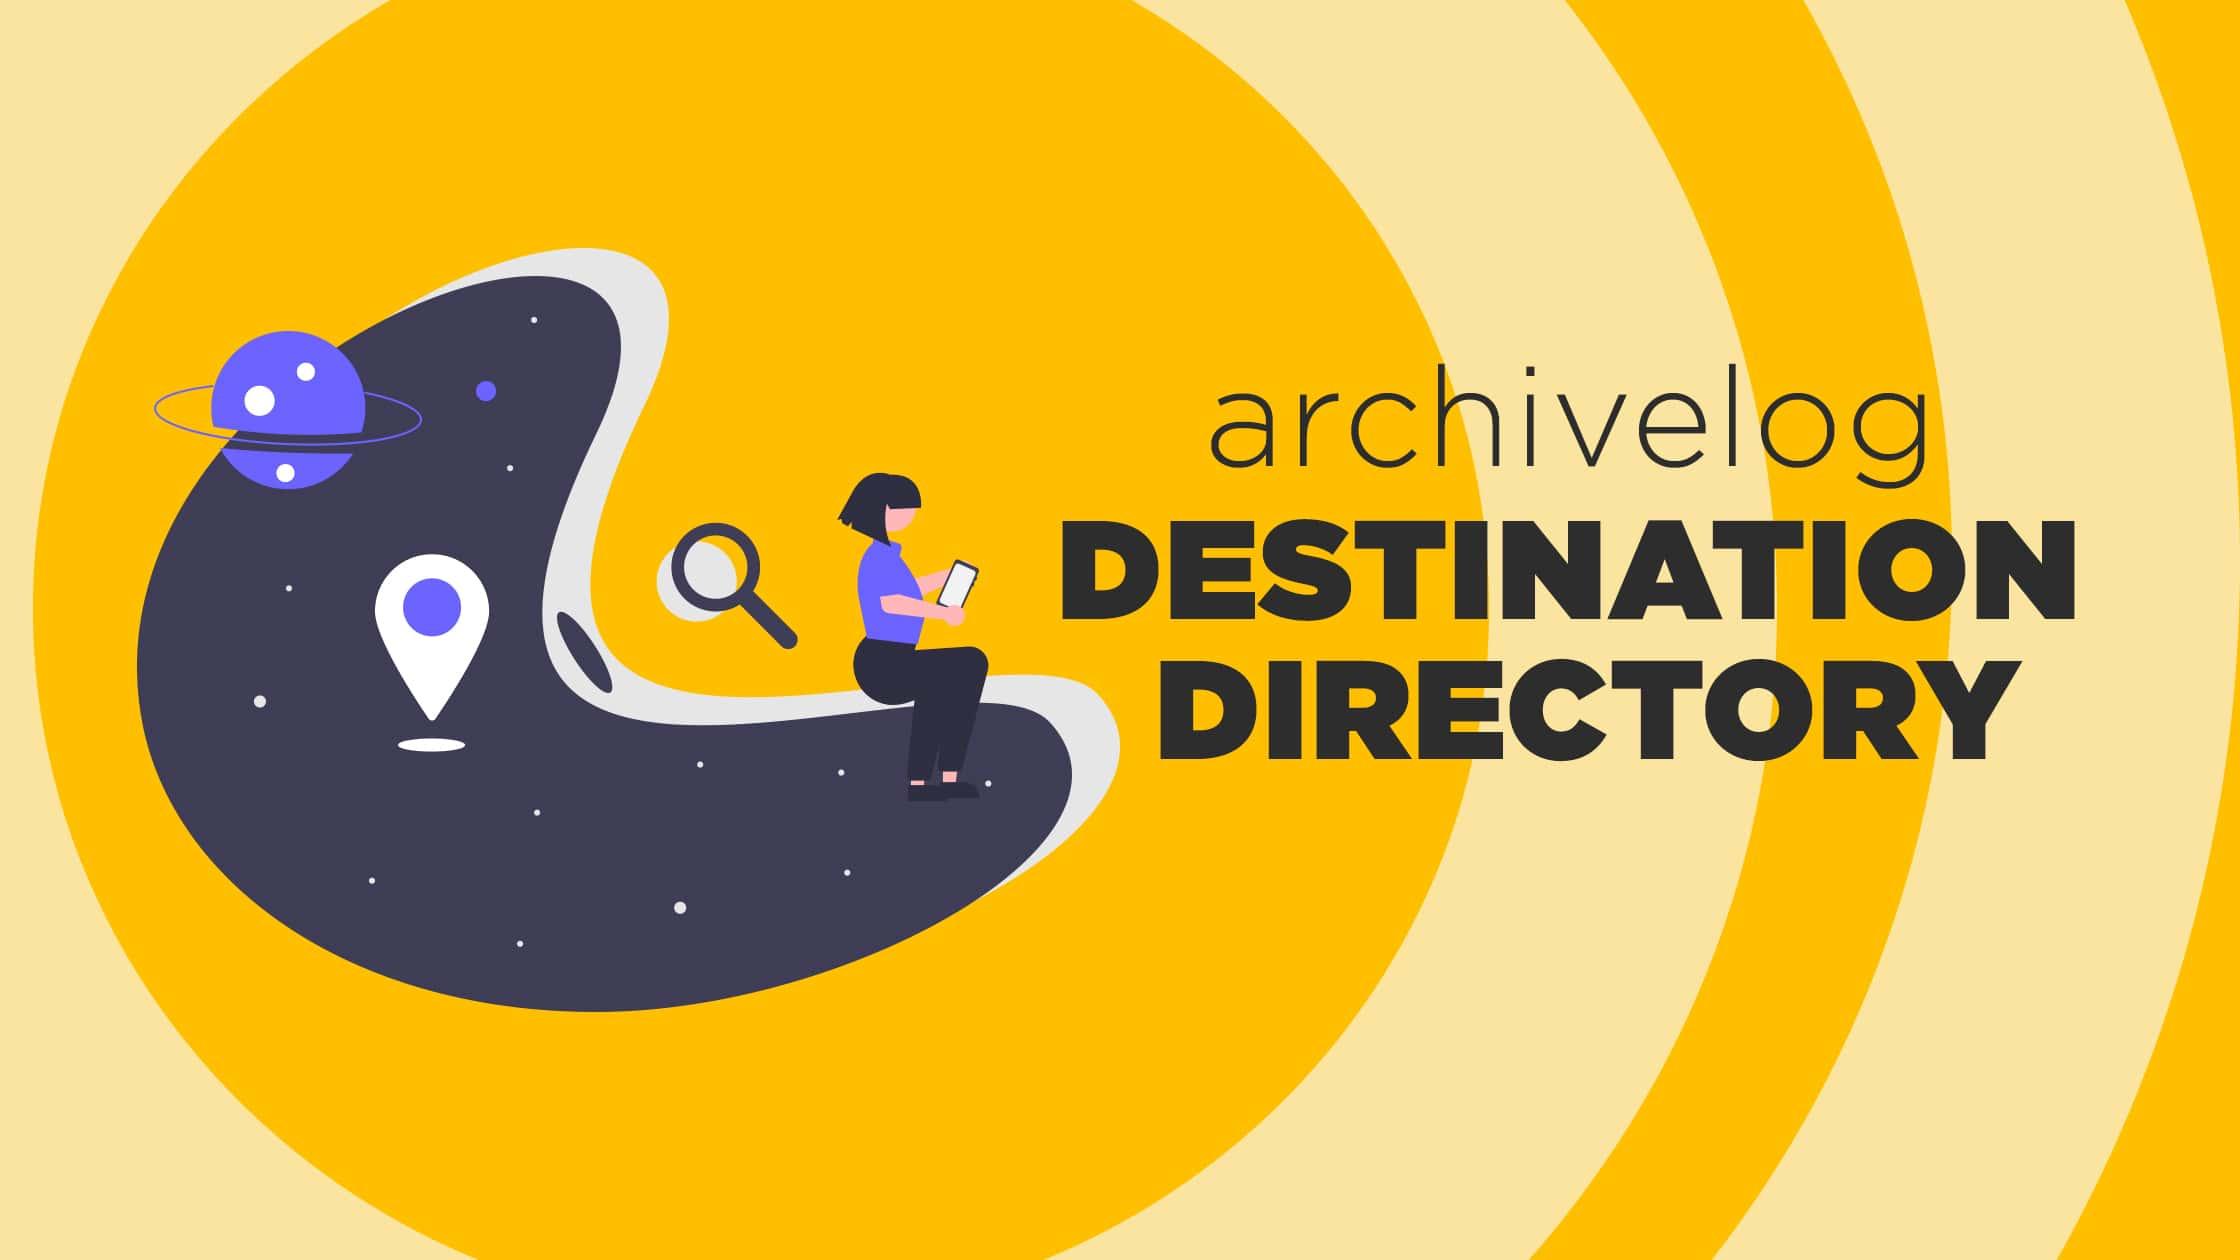 archive log destination directory log_archive_dest_n